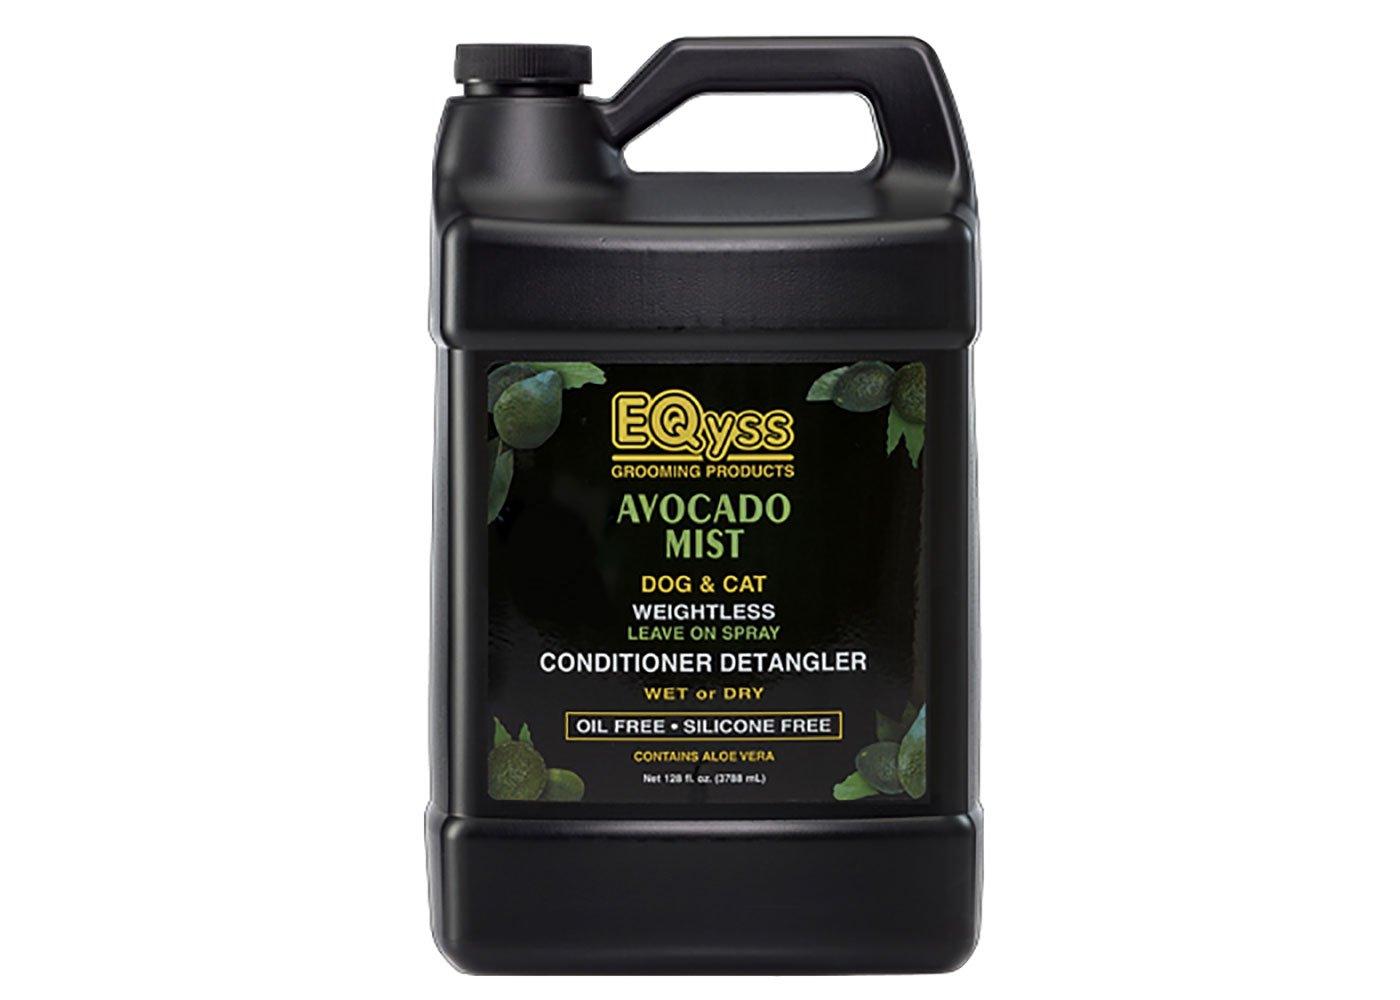 EQyss Avocado Mist Pet Conditioner Spray 128 oz by Eqyss